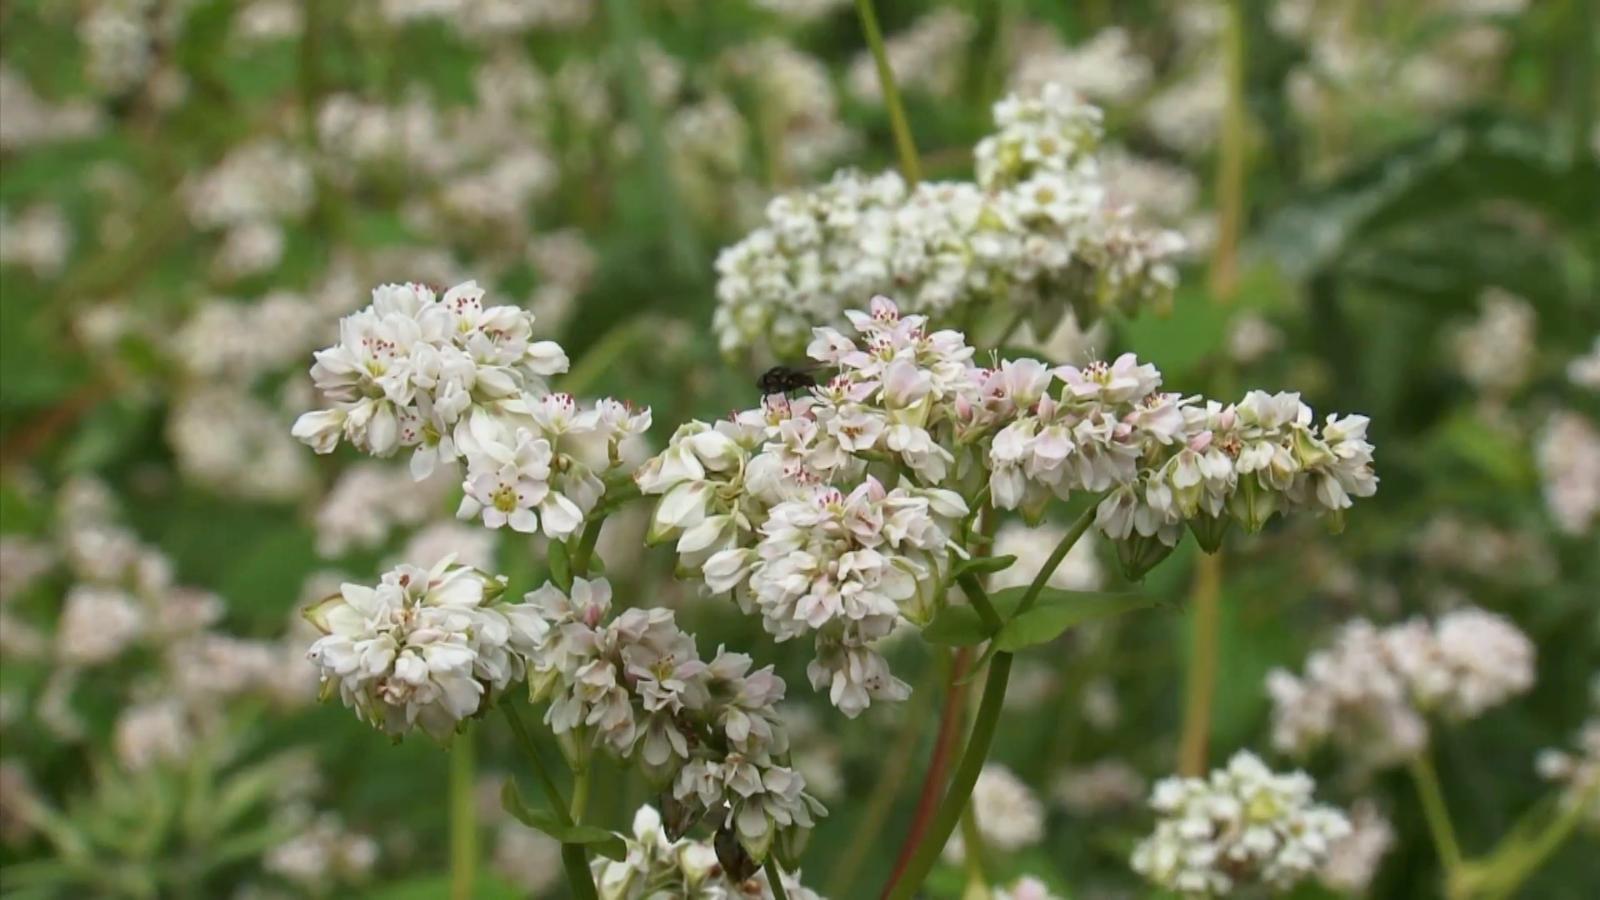 Buckwheat - Fagopyrum esculentum - 100+ seeds - Heirloom!